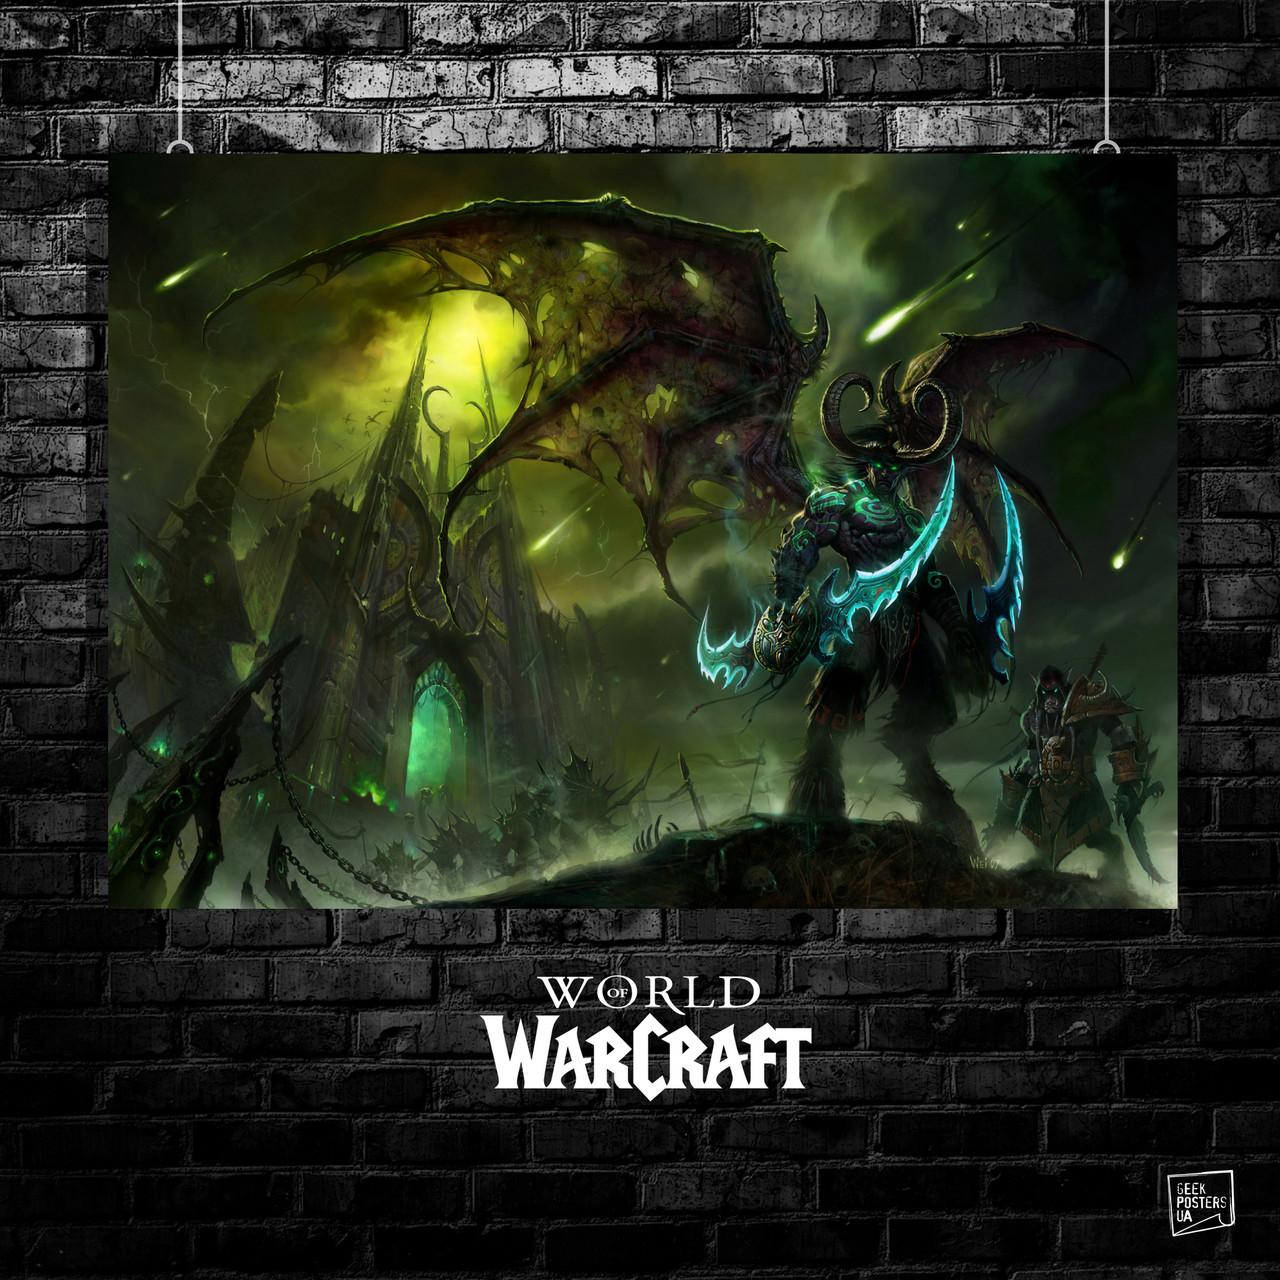 Постер Варкрафт, World of Warcraft, Иллидан. Размер 60x42см (A2). Глянцевая бумага